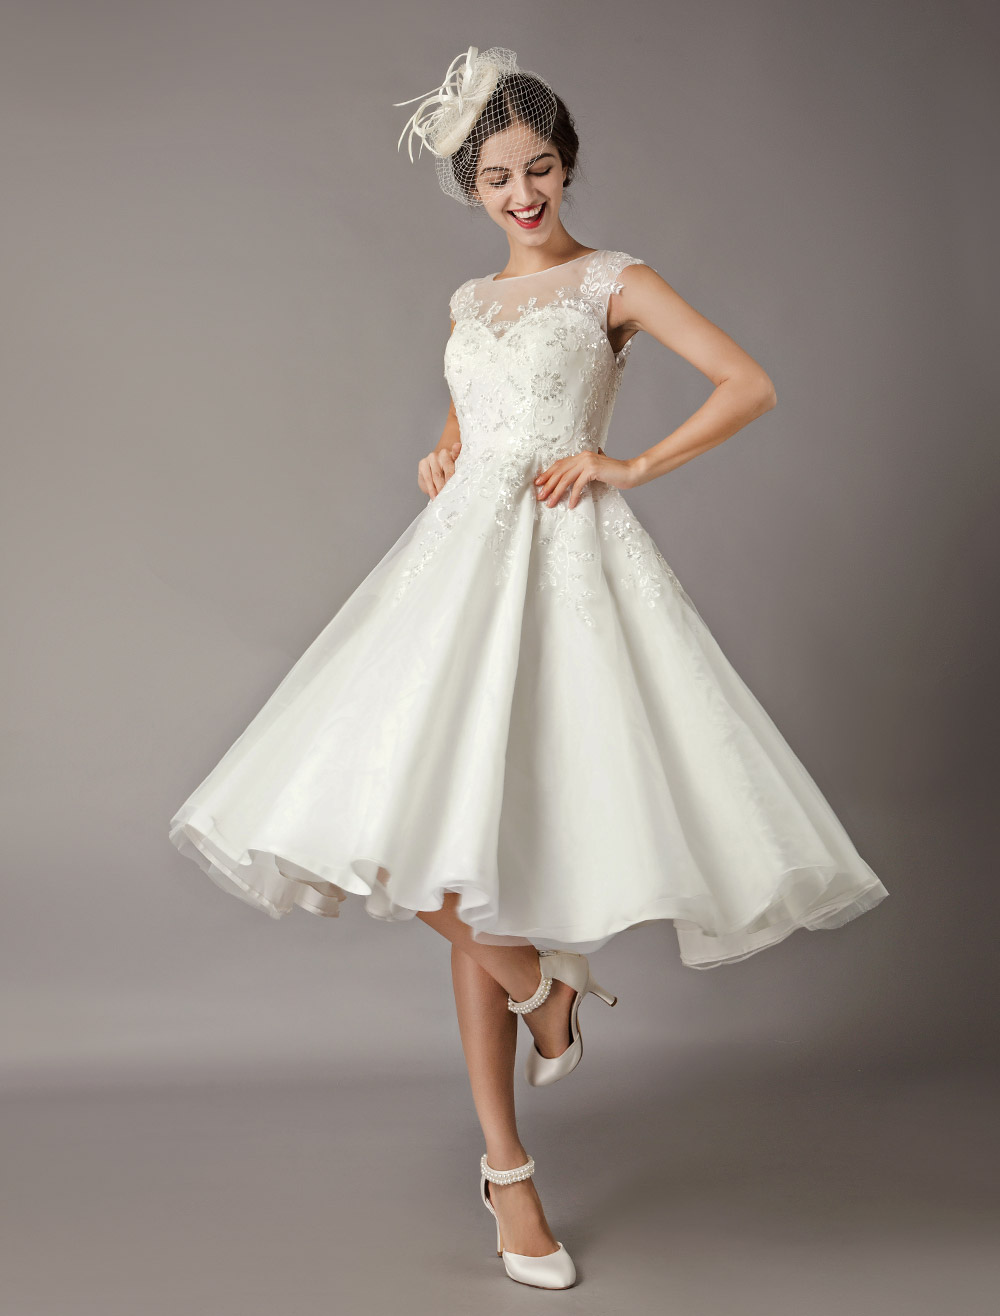 Vintage Wedding Dresses Short Lace Tulle Sequin Tea Length Ivory Bridal Dress Milanoo Com